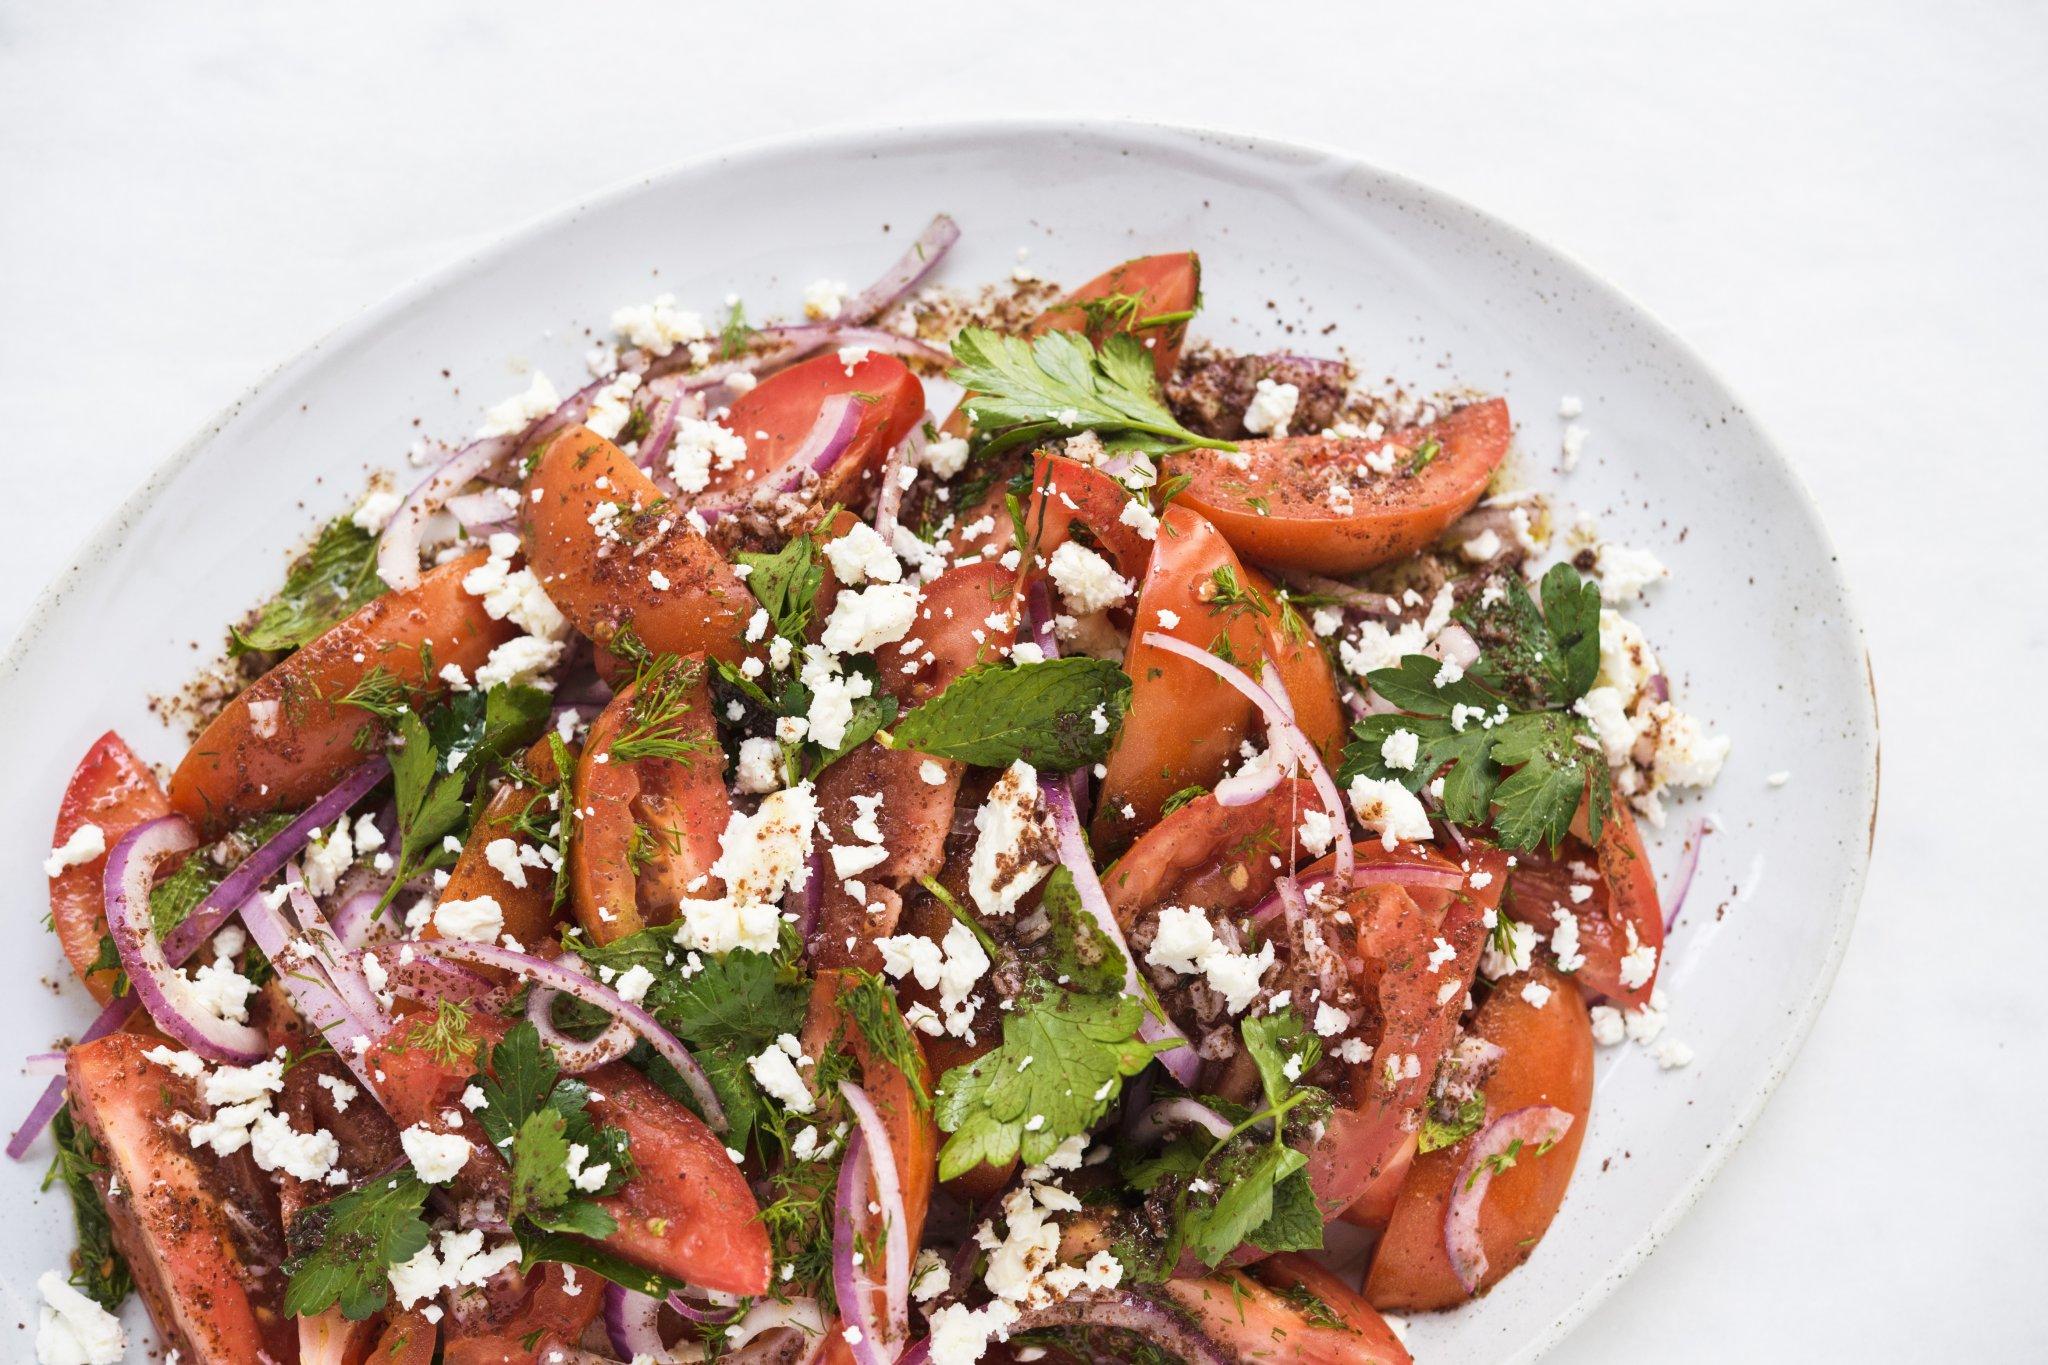 Tomato-Herb Salad with Sumac